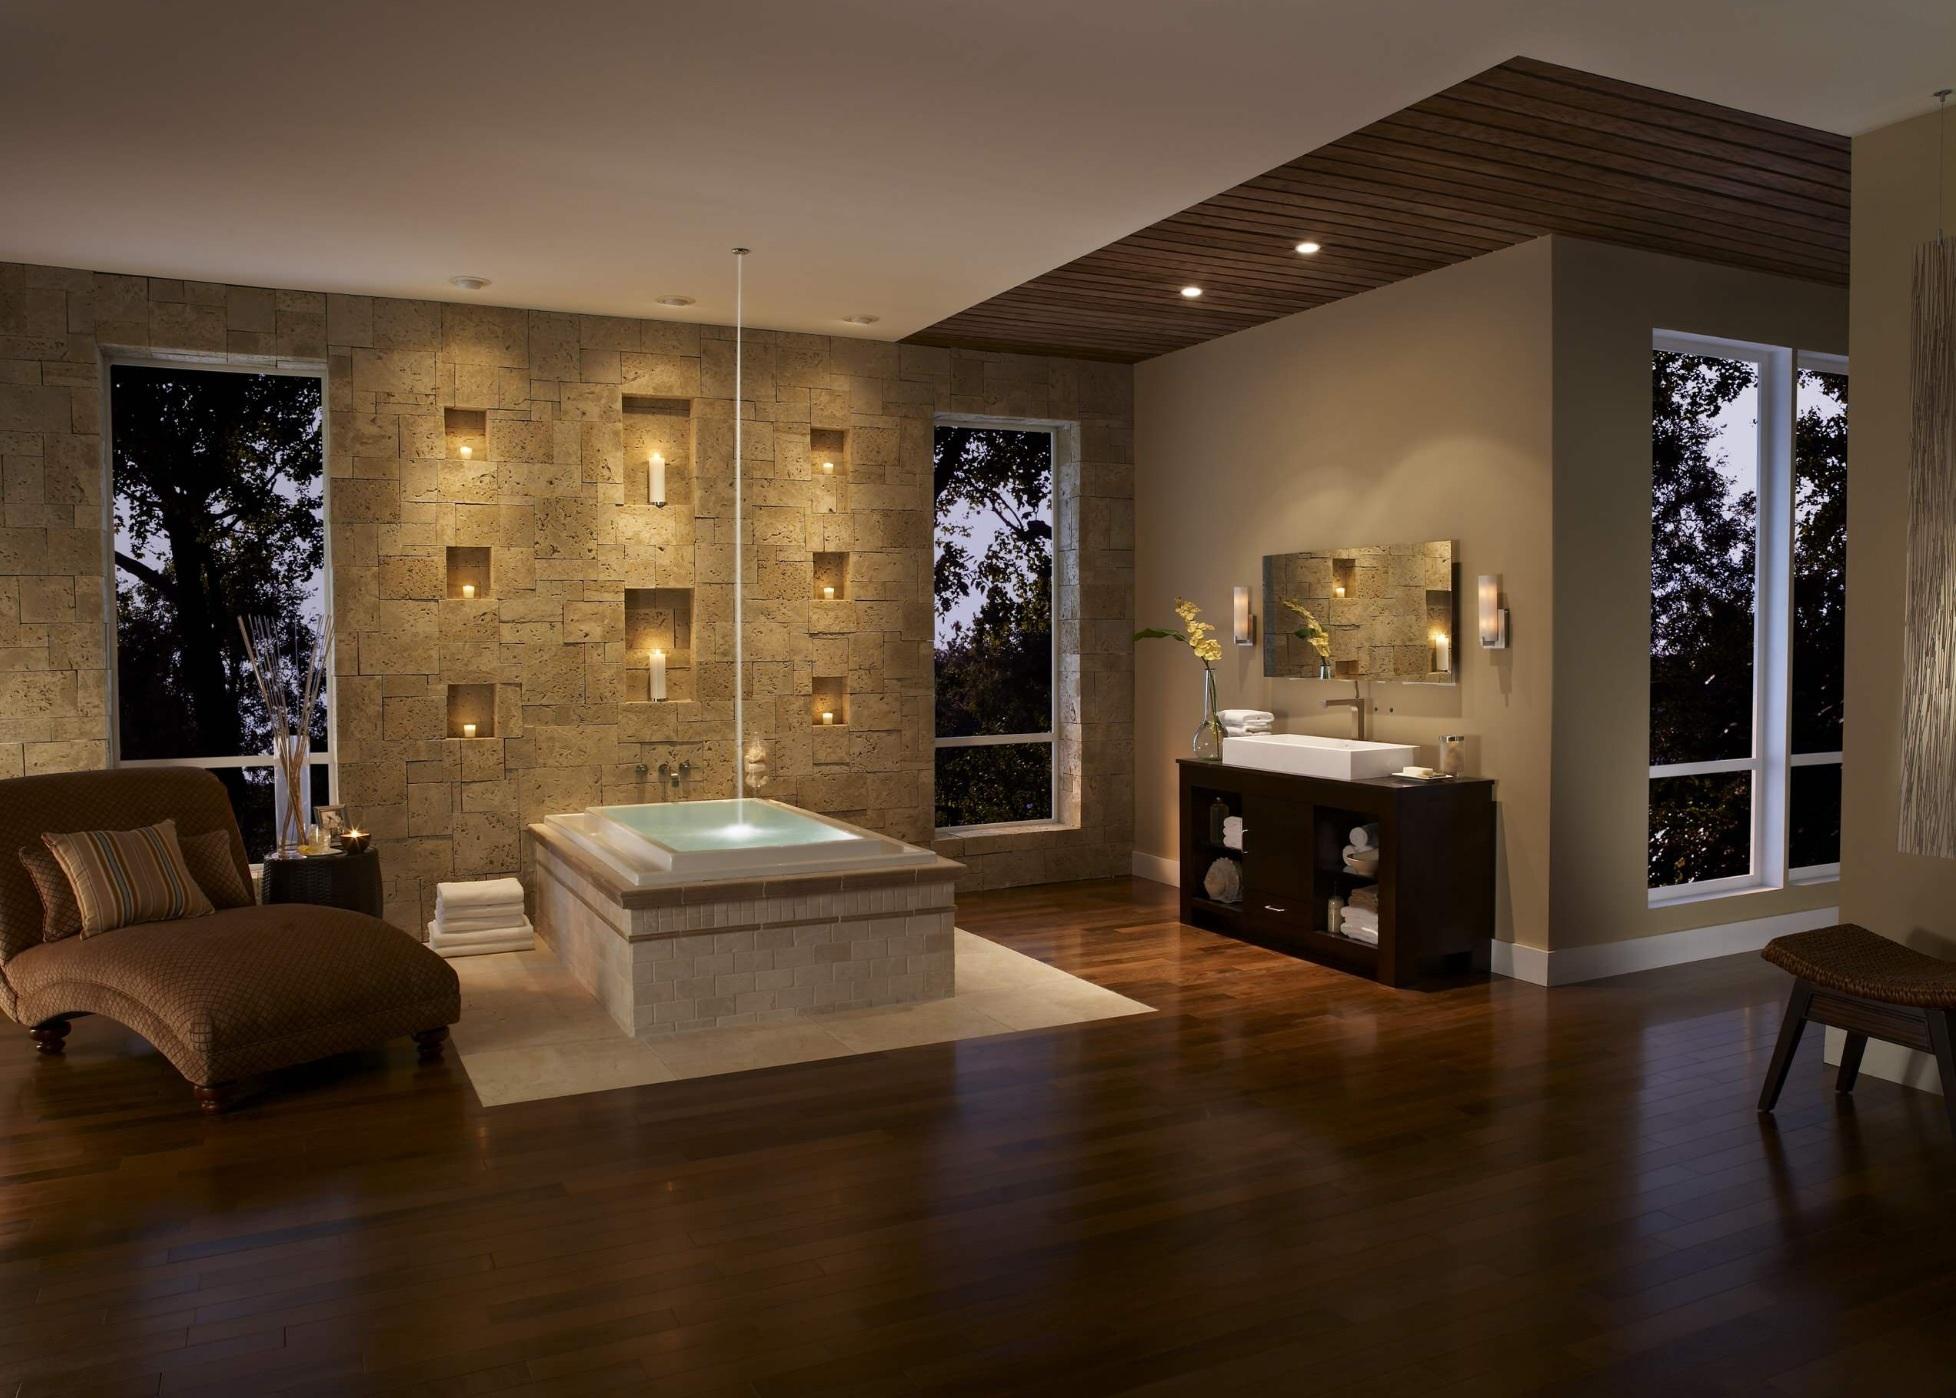 Amazing Home Bathroom Decorating Ideas 1956 x 1398 · 563 kB · jpeg